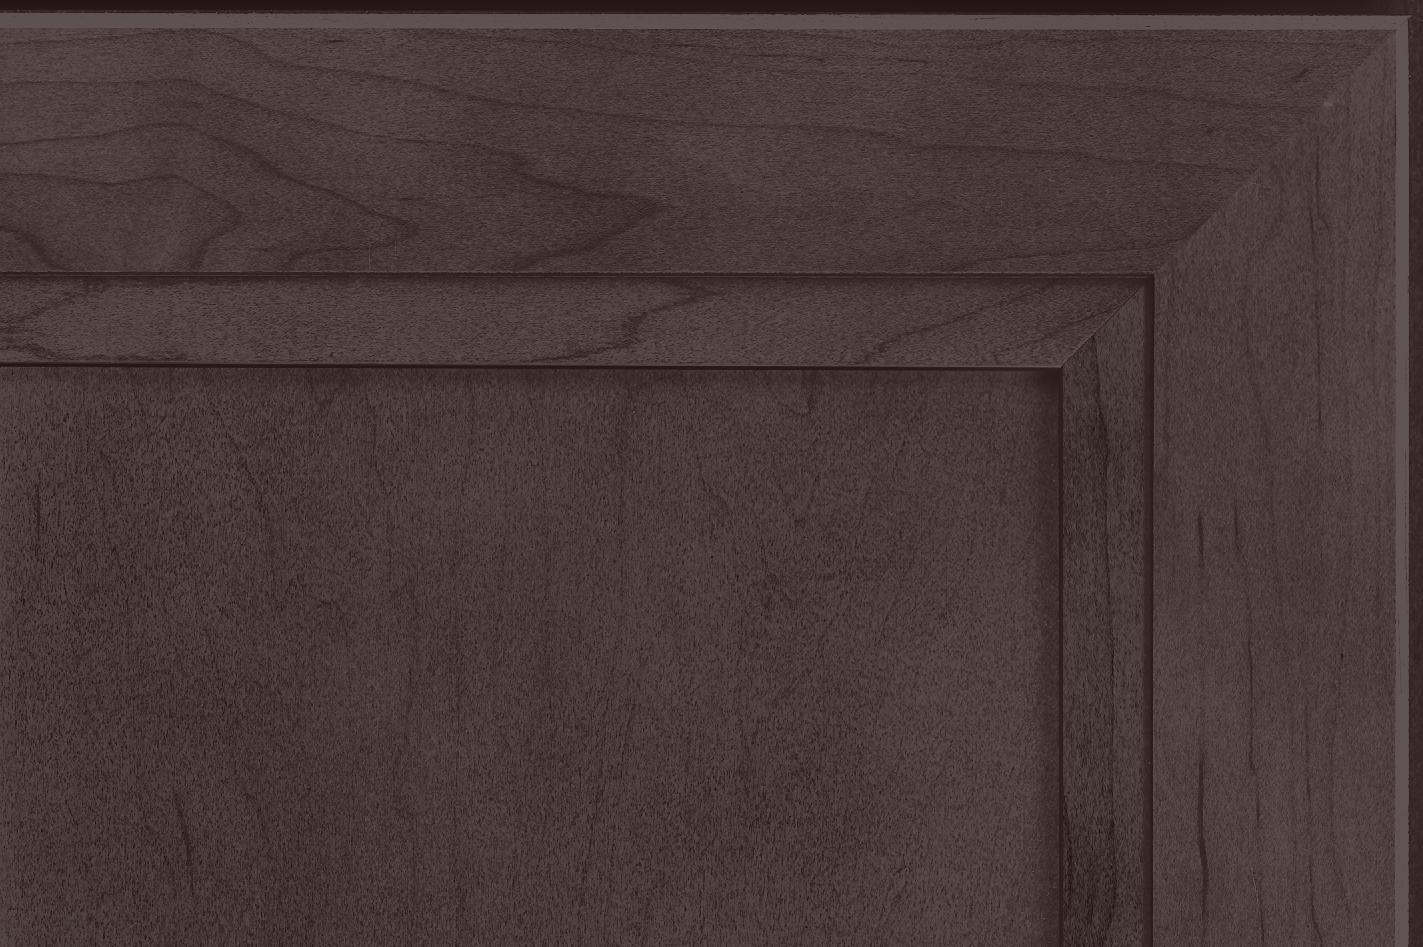 Merillat Classic Basalt In 2020 Staining Cabinets Basalt Stain